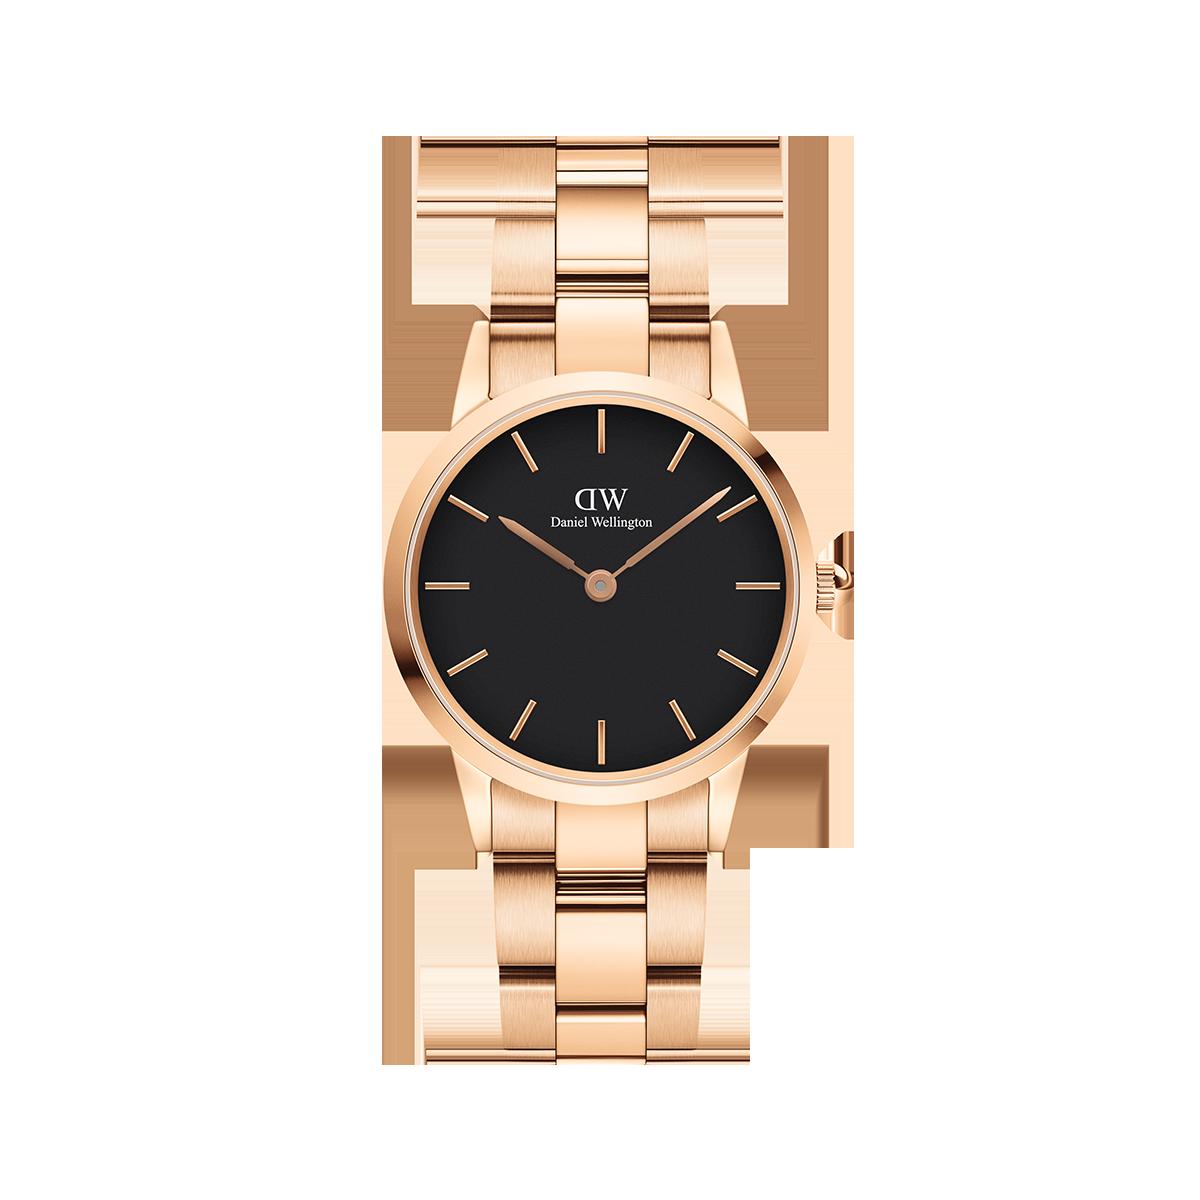 nuova collezione 910f1 0881f Daniel Wellington | Timeless and elegant watches online